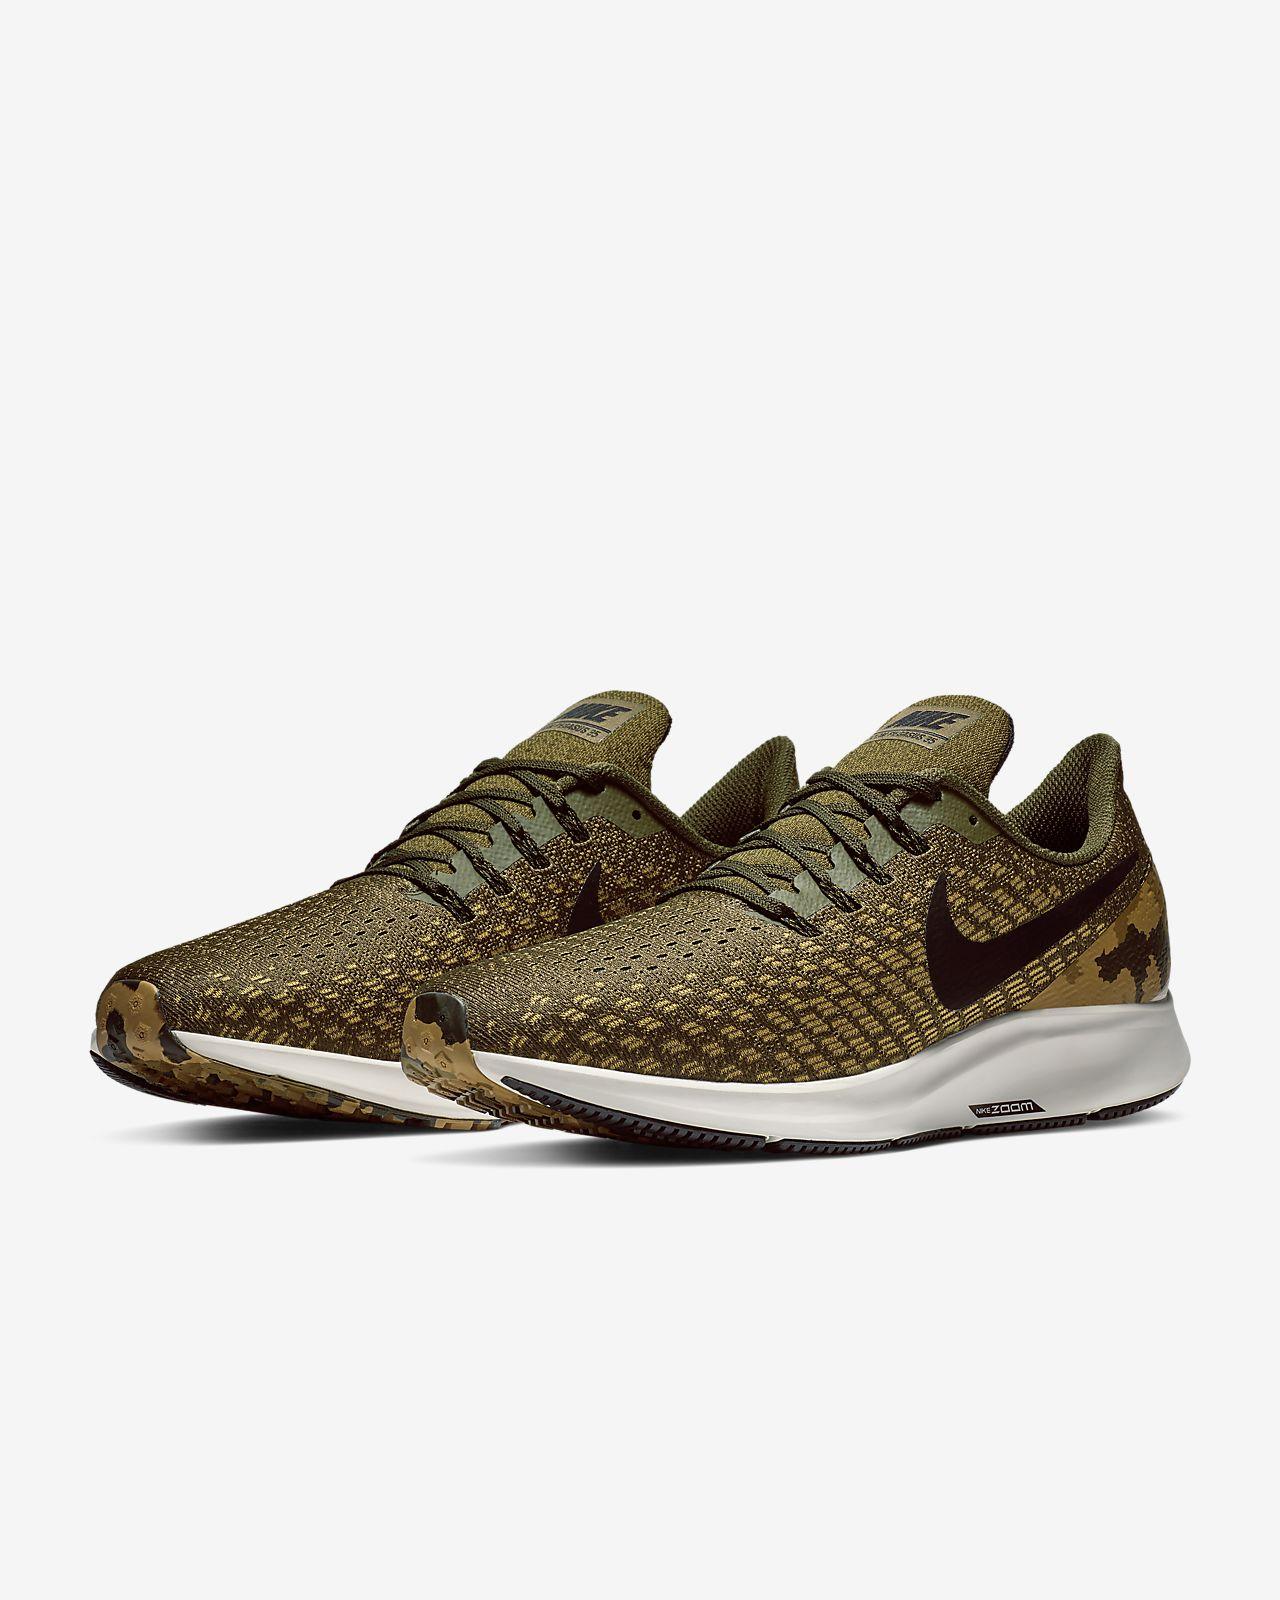 22b72bbe1538 Nike Air Zoom Pegasus 35 Men s Camo Running Shoe. Nike.com